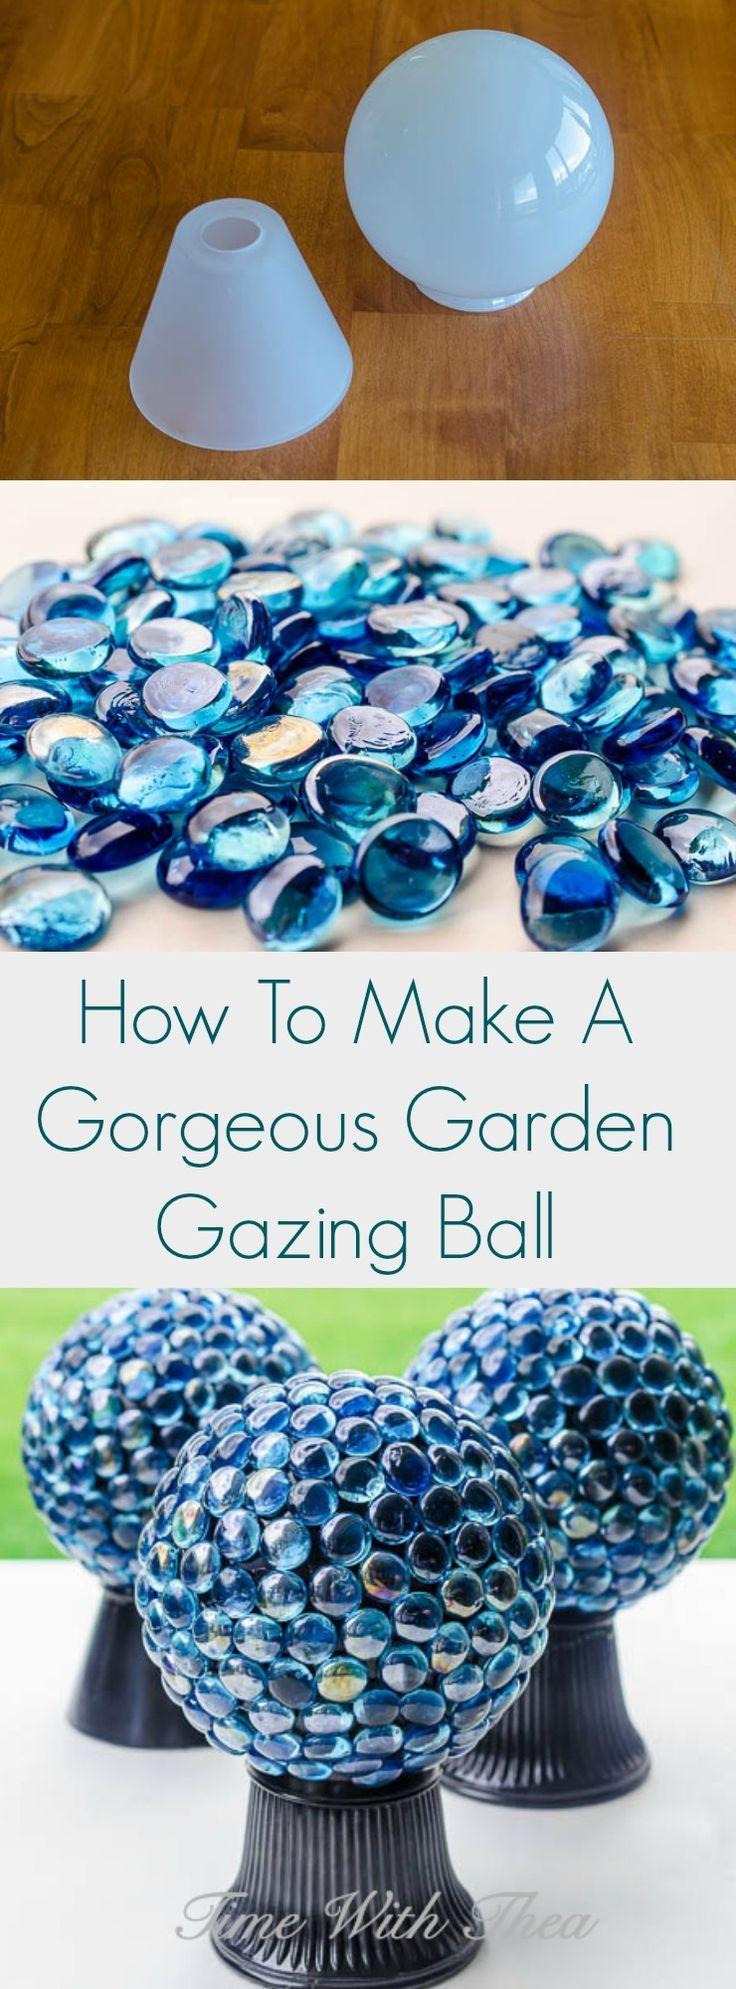 how to make a gorgeous garden gazing ball   dollar stores, gardens